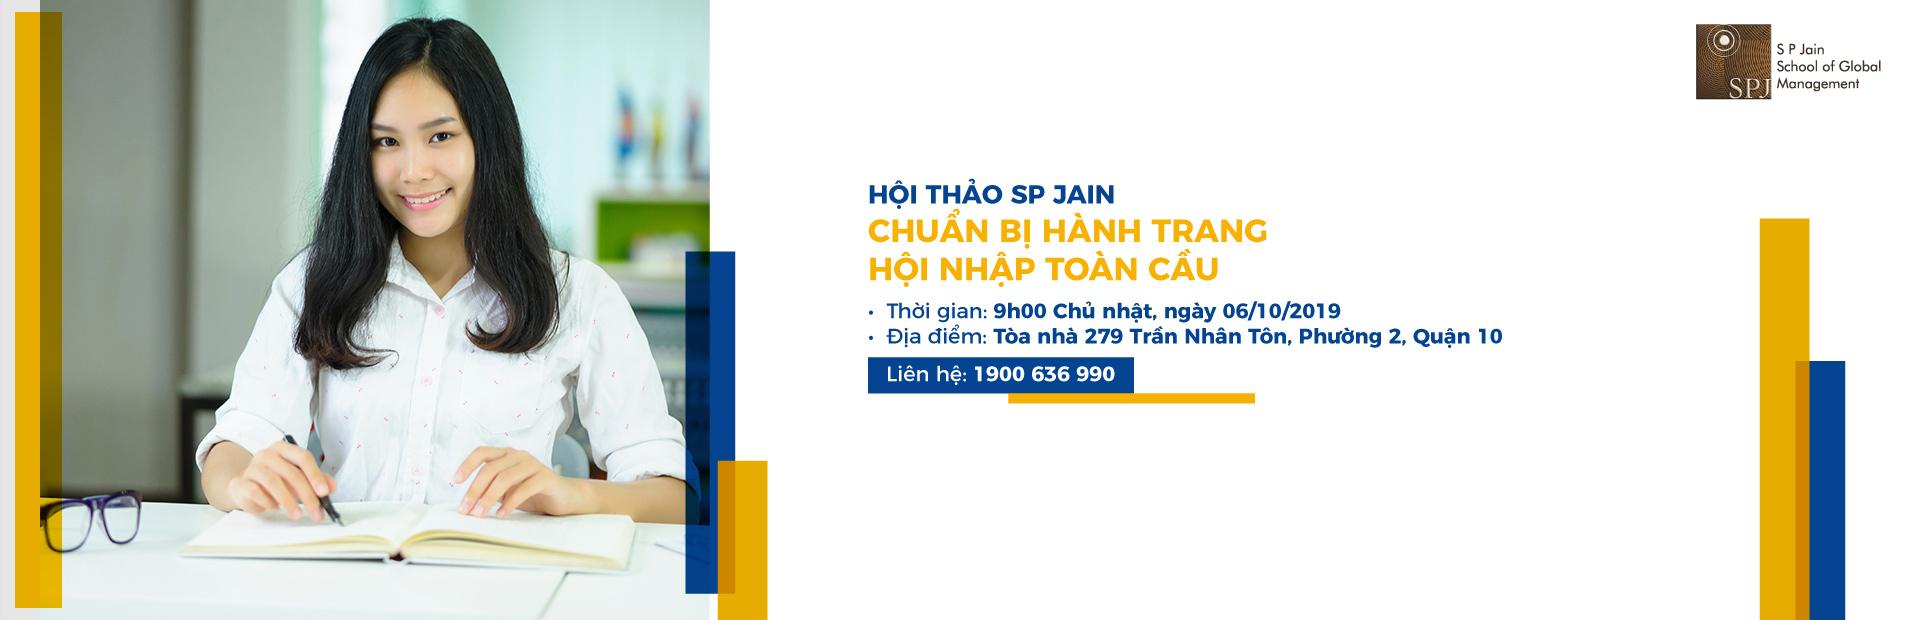 SP Jain 10.2019